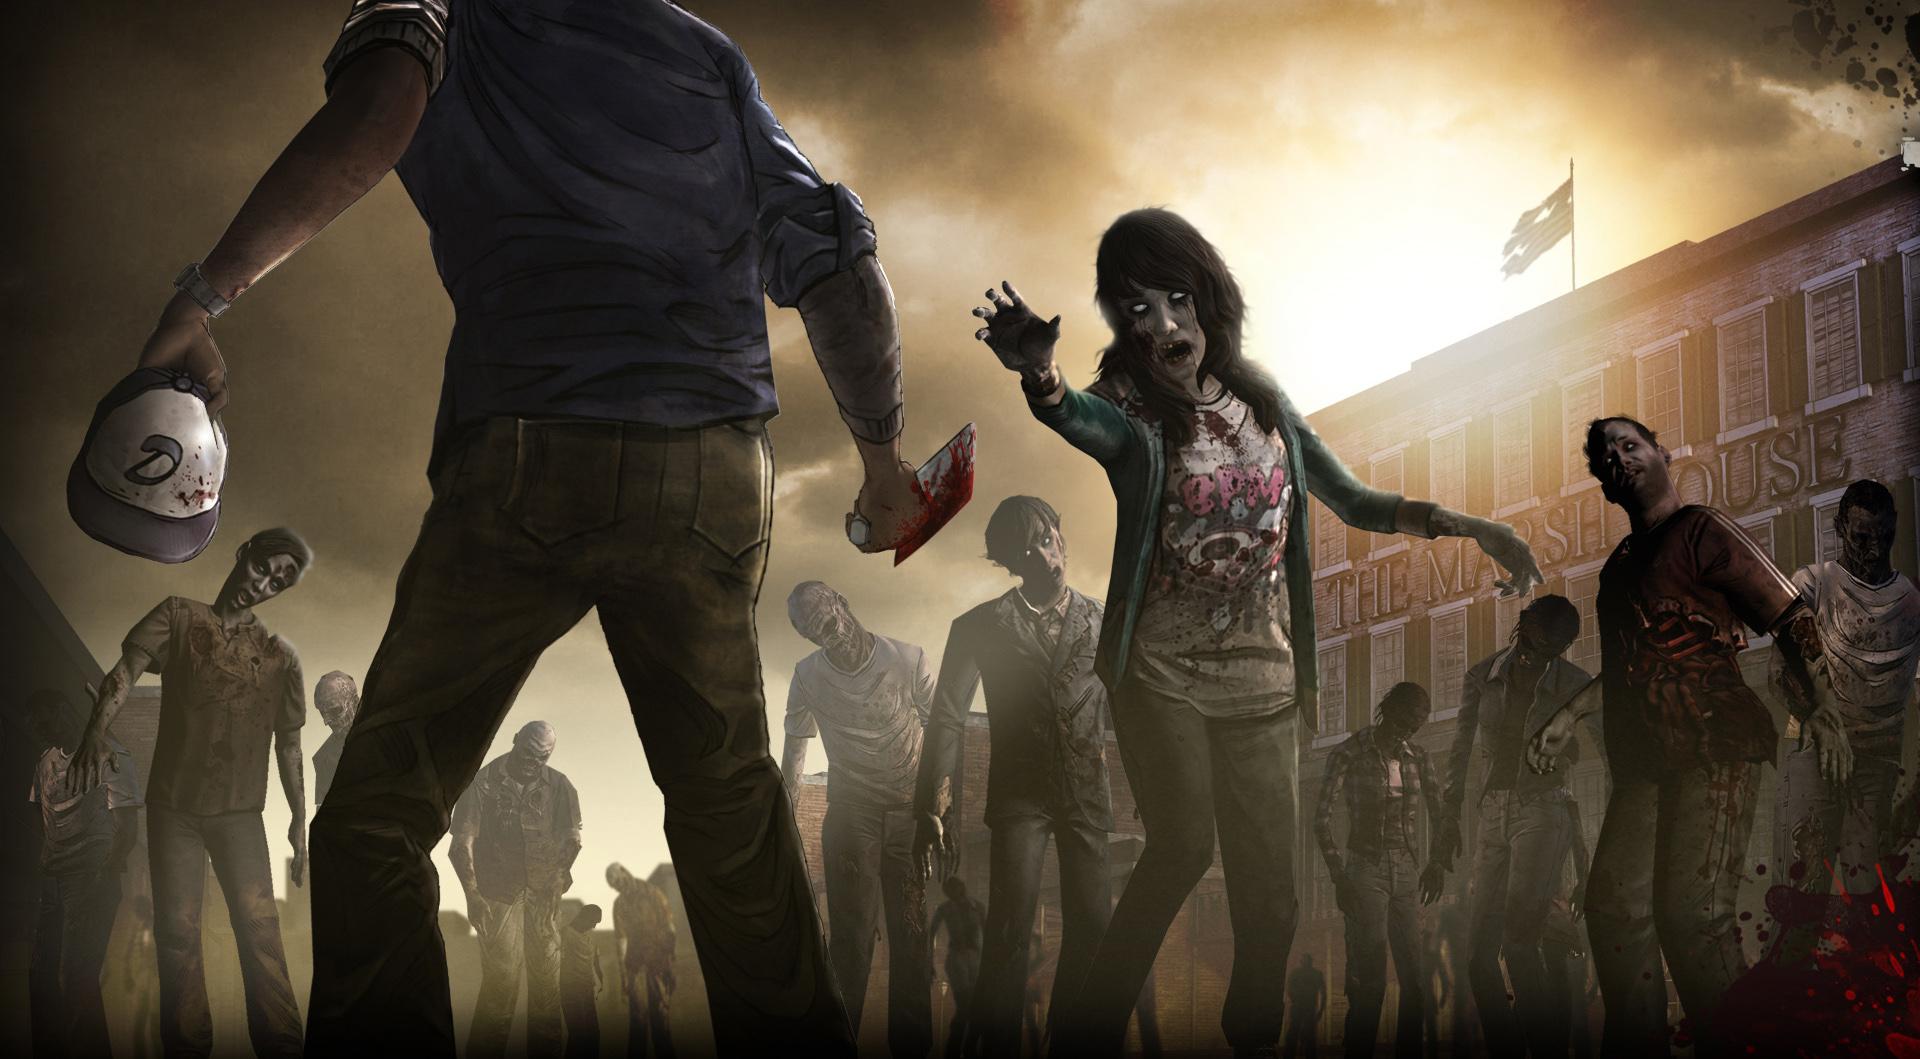 The Walking Dead iPhone Wallpaper - WallpaperSafari